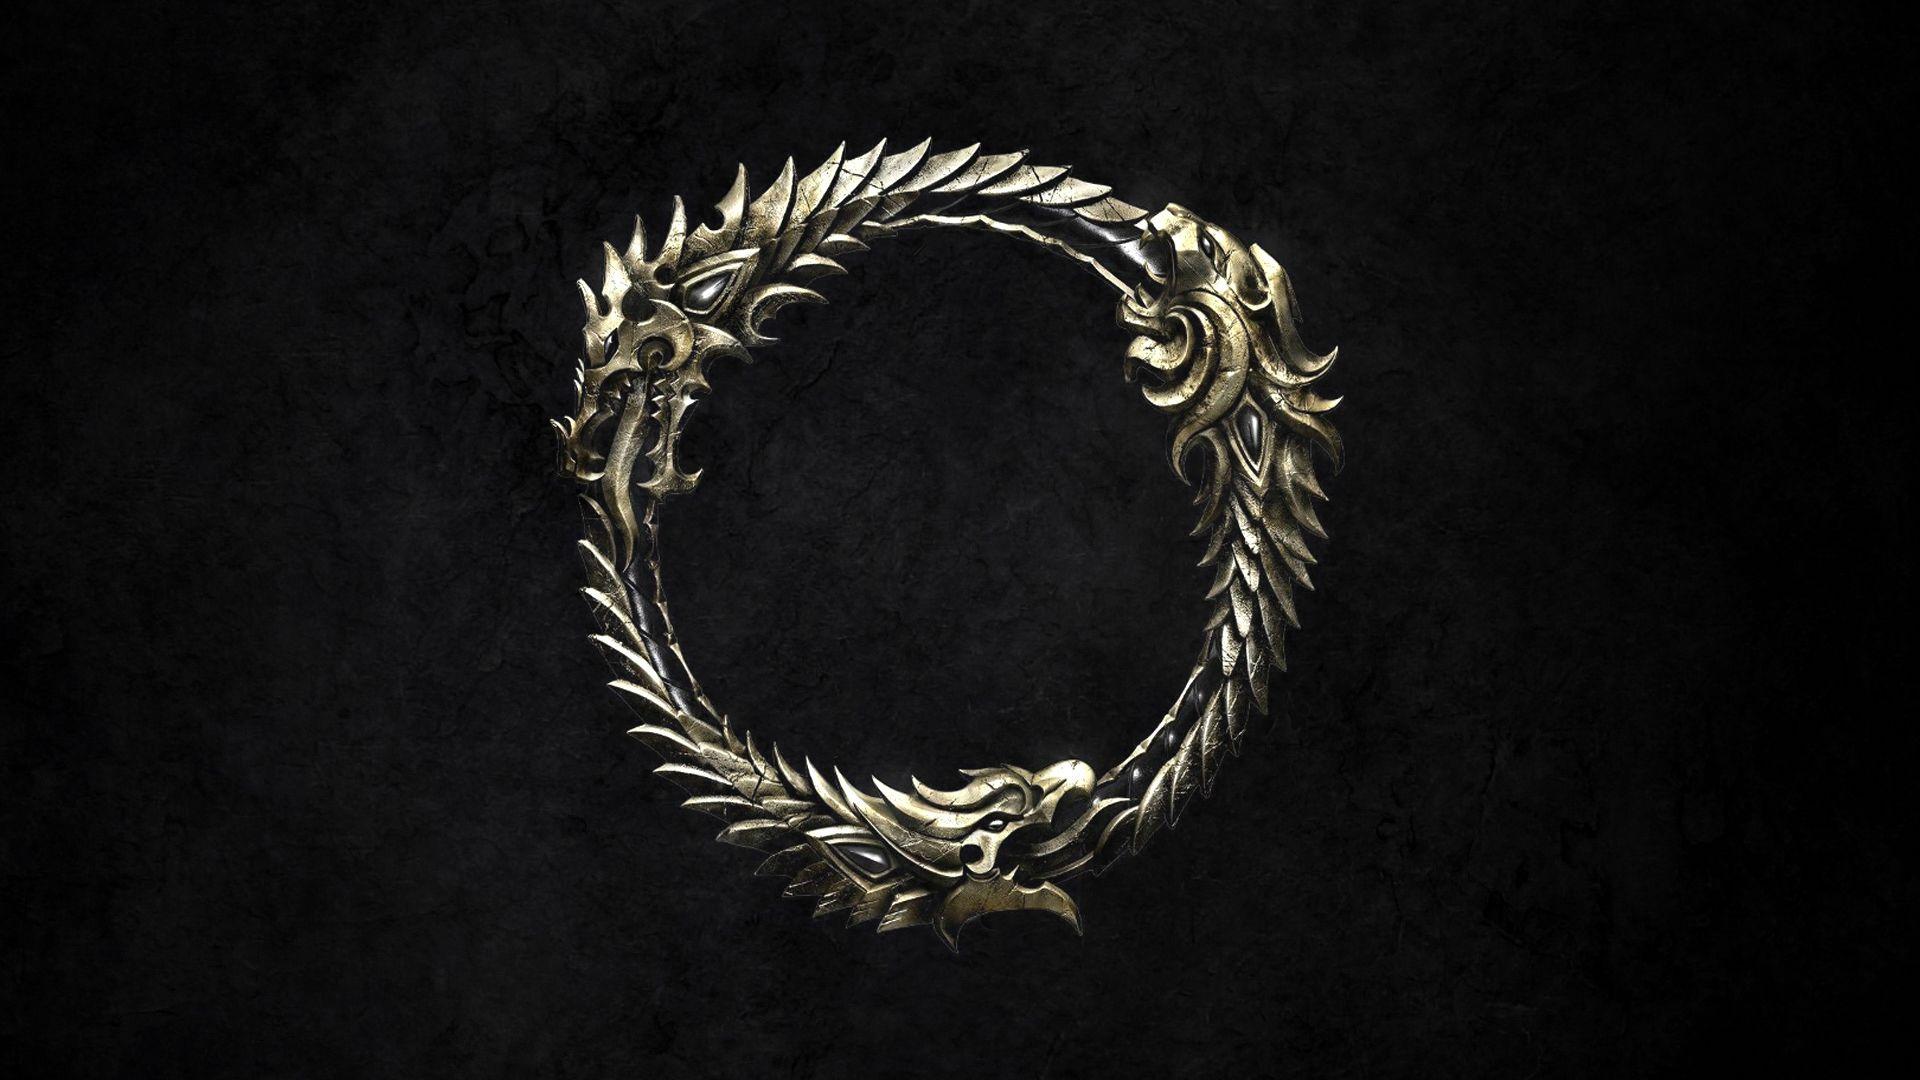 Elder Scrolls Online Game Logo Hd 1920x1080 Jpg 1920 1080 Elder Scrolls Online Elder Scrolls Game Logo